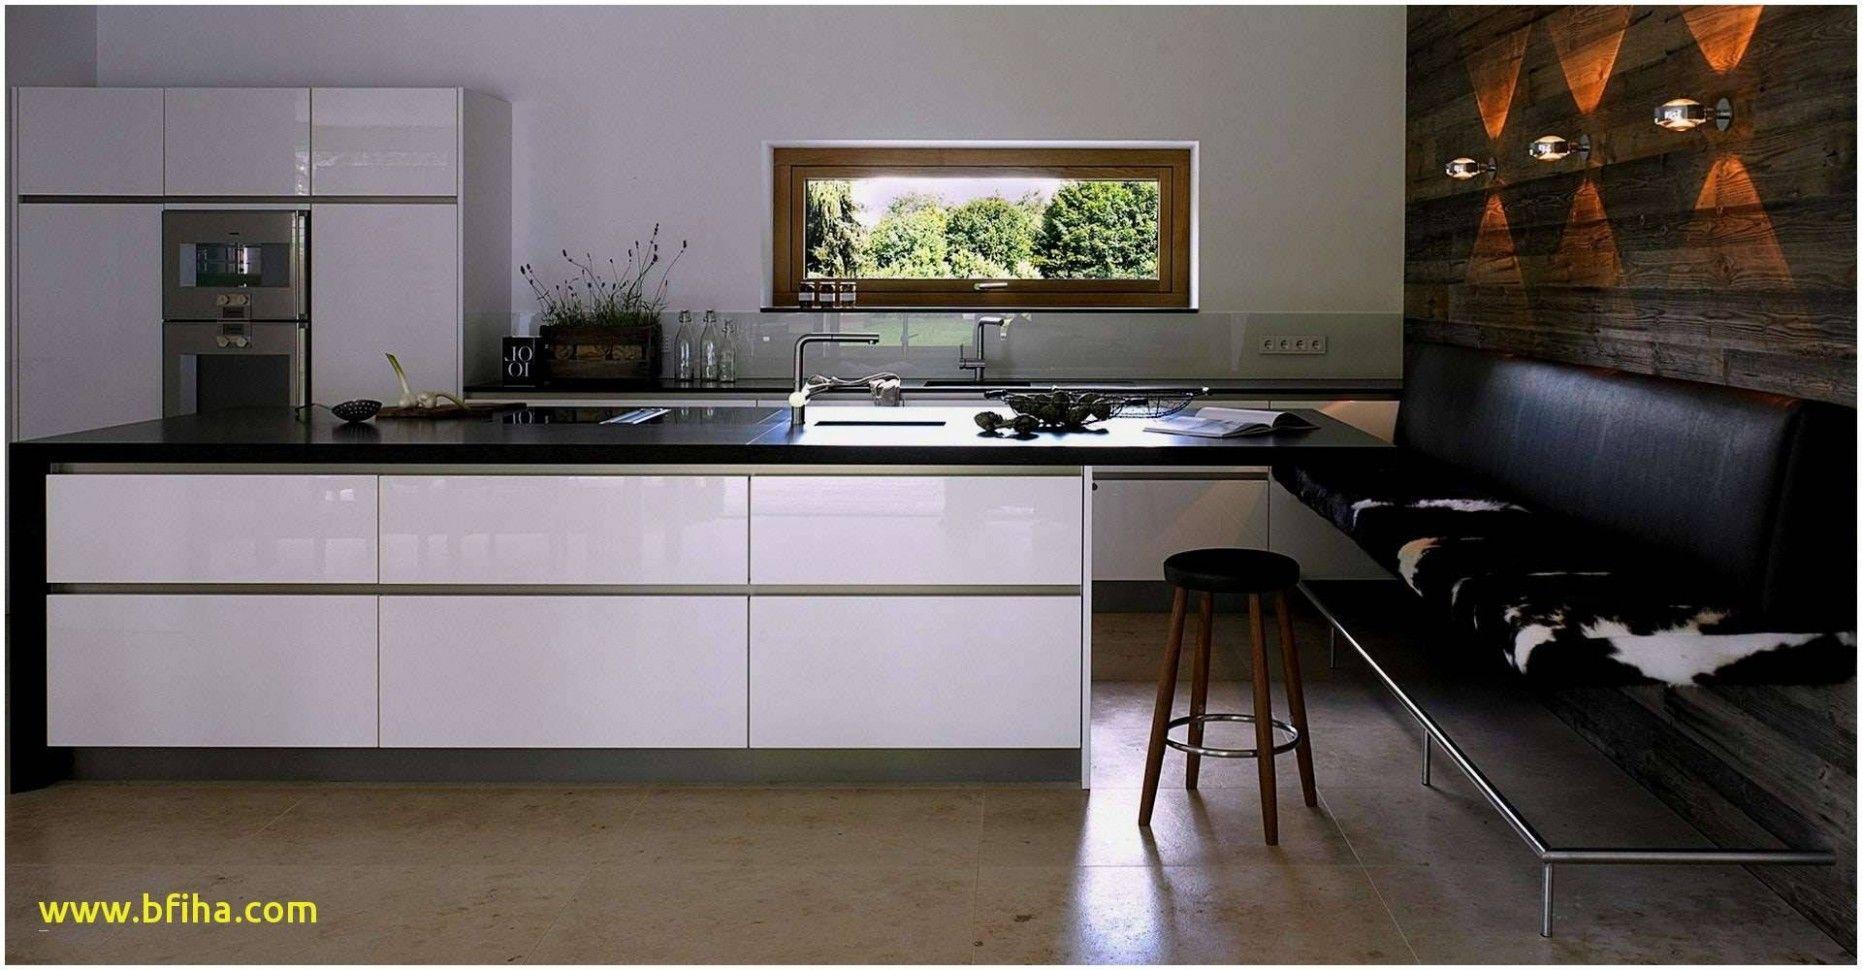 Design Heizkörper Wohnzimmer Kermi  House interior, Home, Home decor